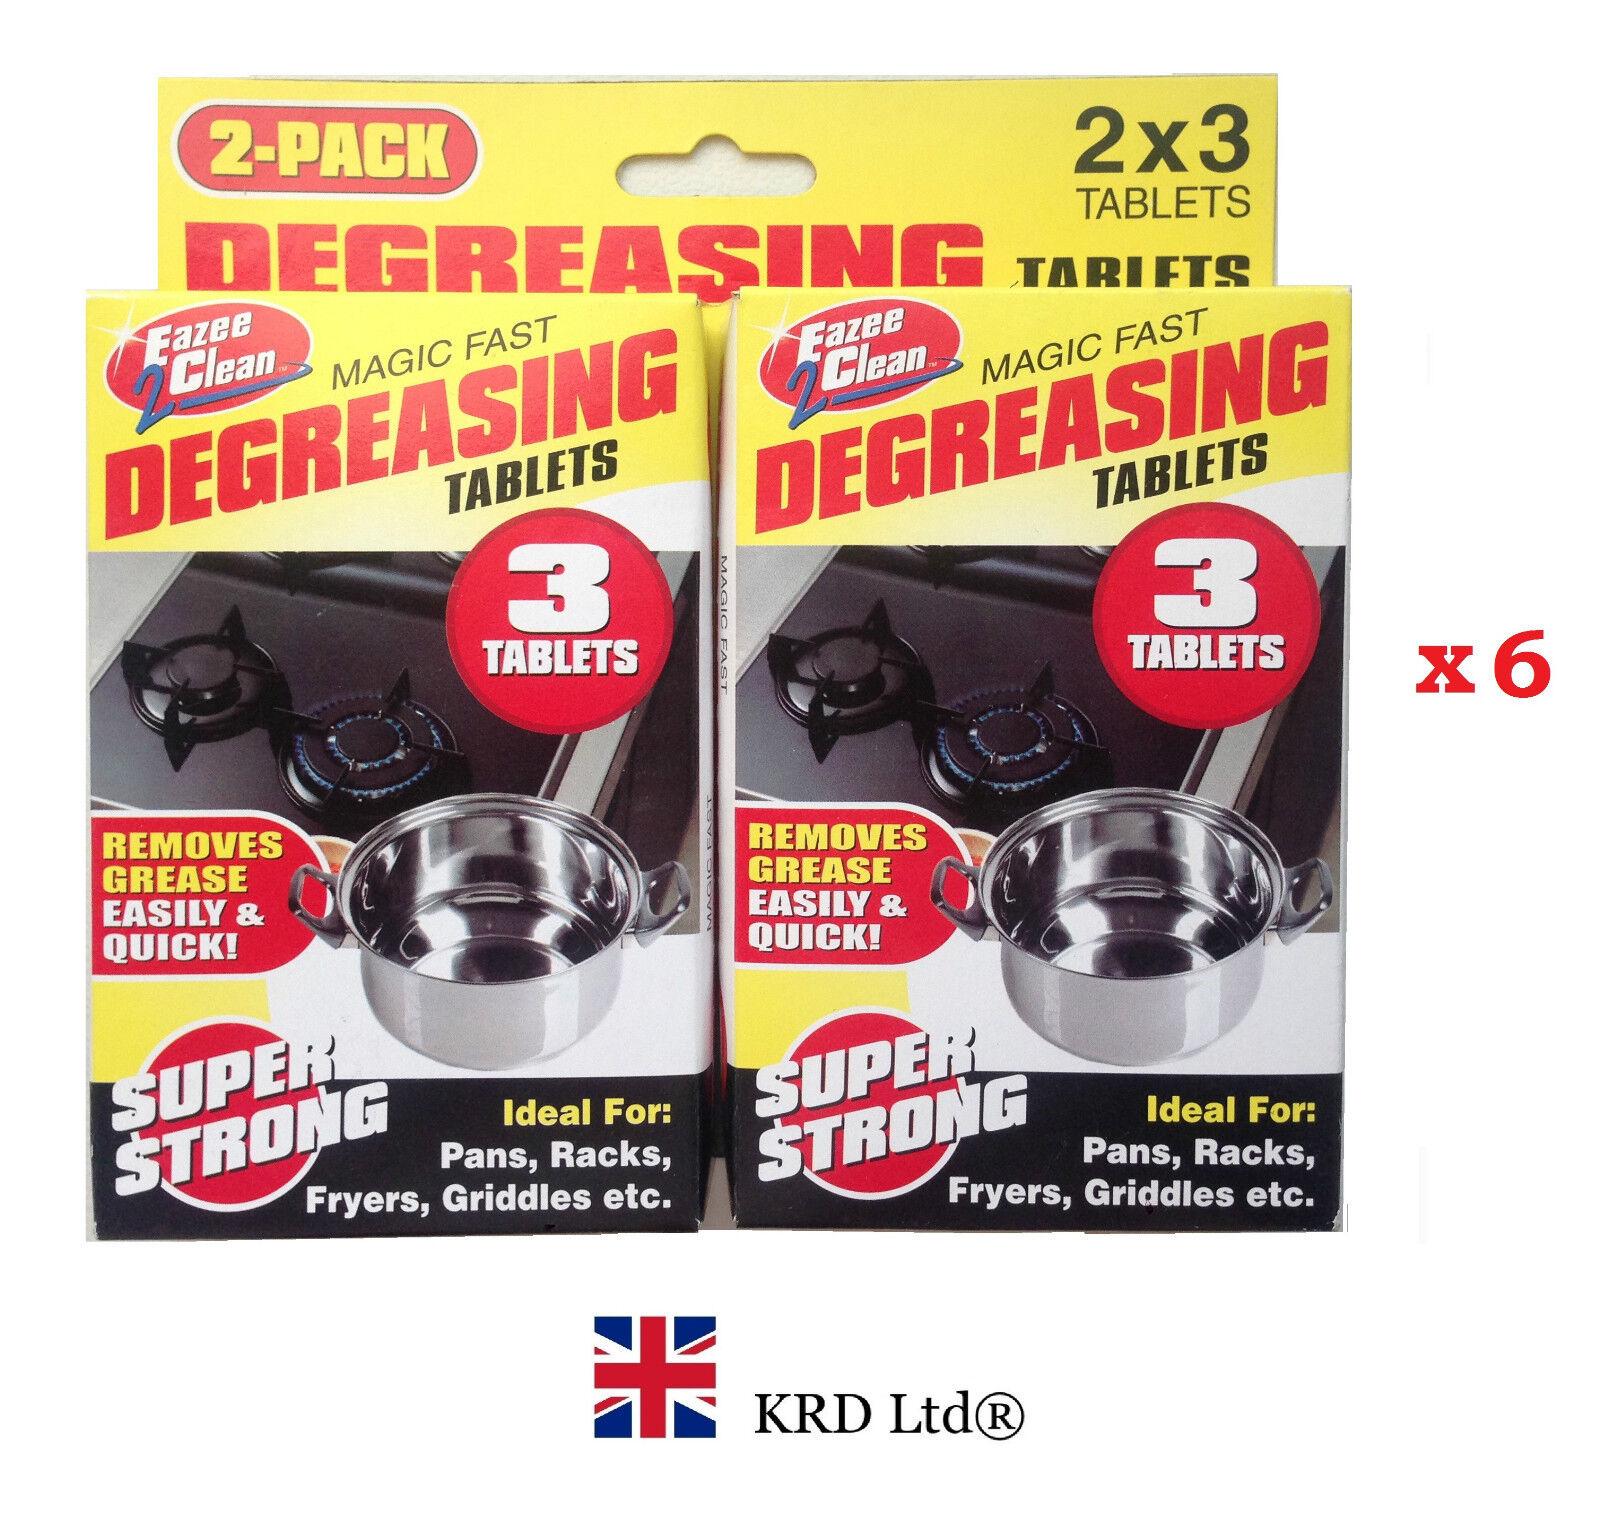 6 x degreasing tablets kitchen cleaner pots oven stove grease oil fat remover ebay. Black Bedroom Furniture Sets. Home Design Ideas